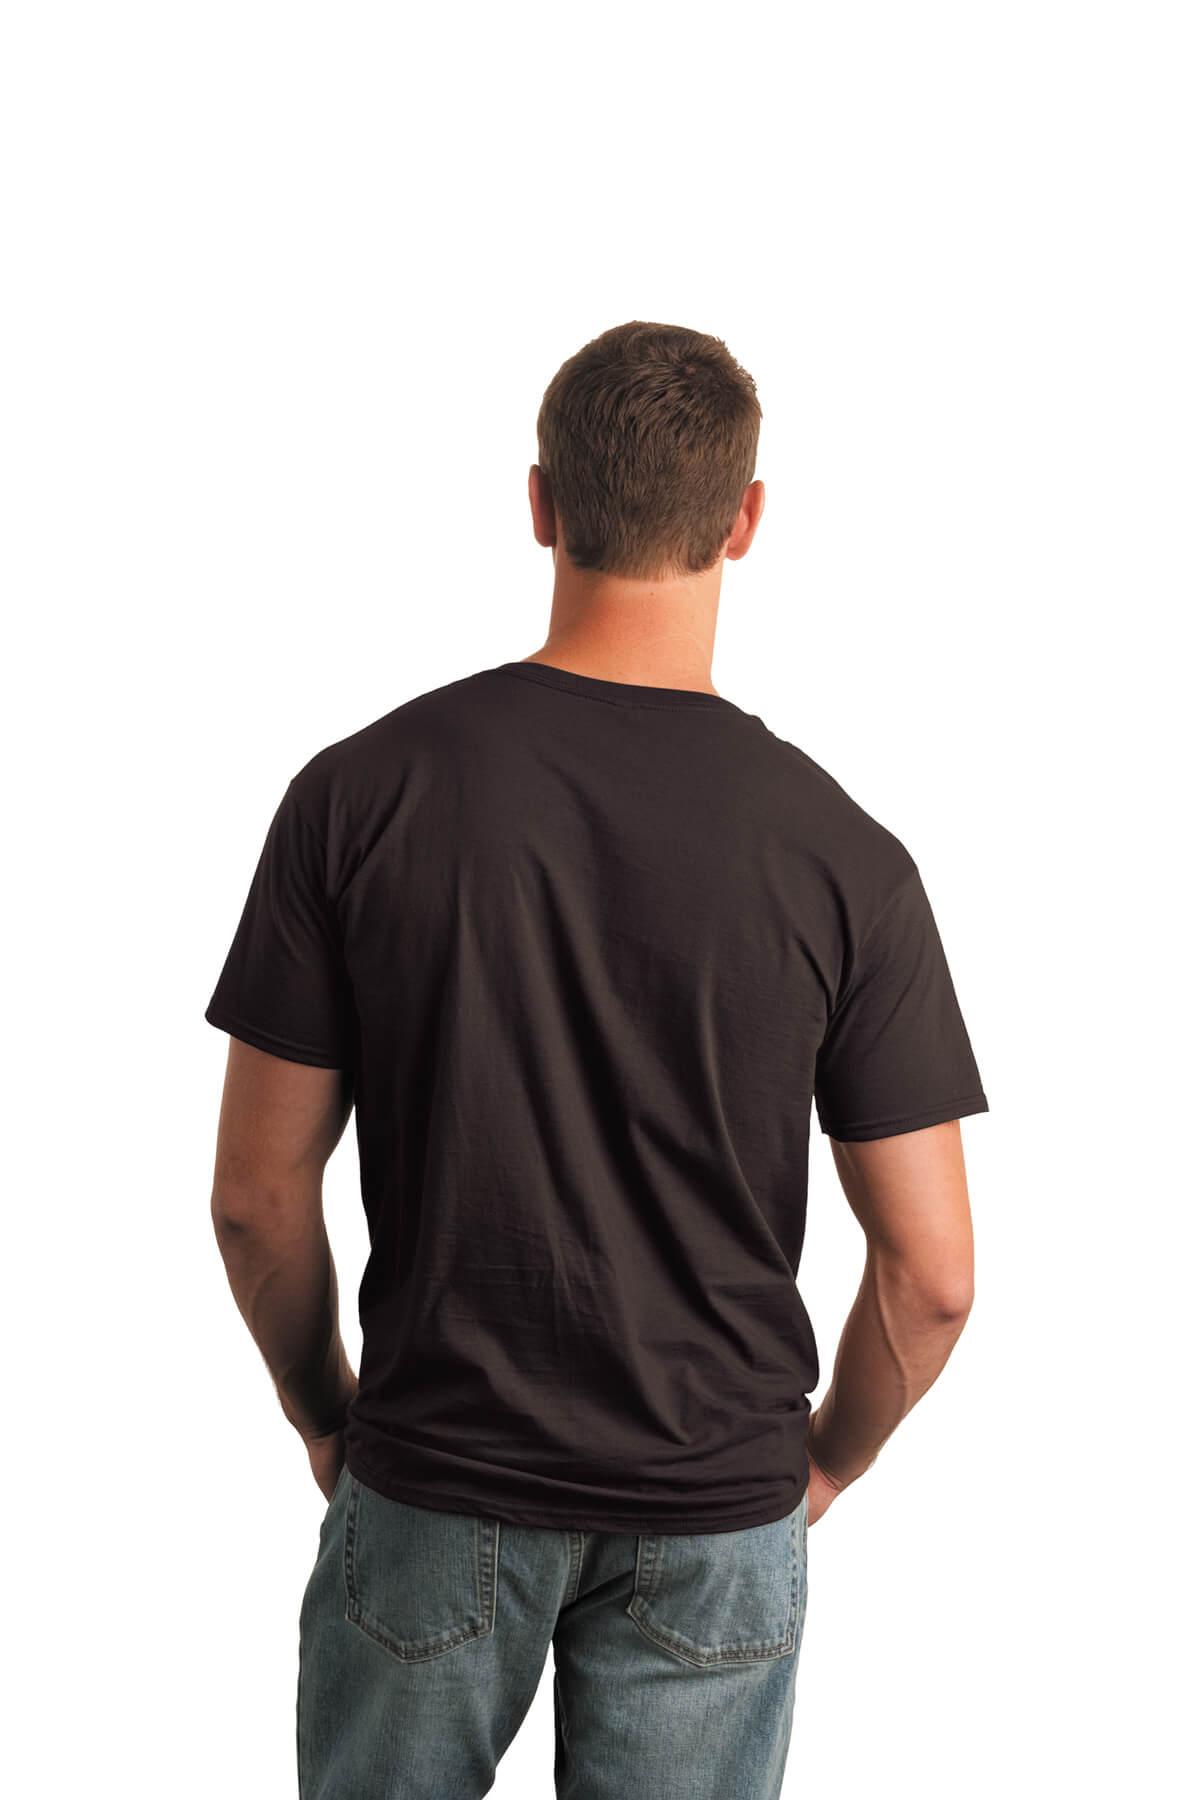 Dark Chocolate T-Shirt Model Back